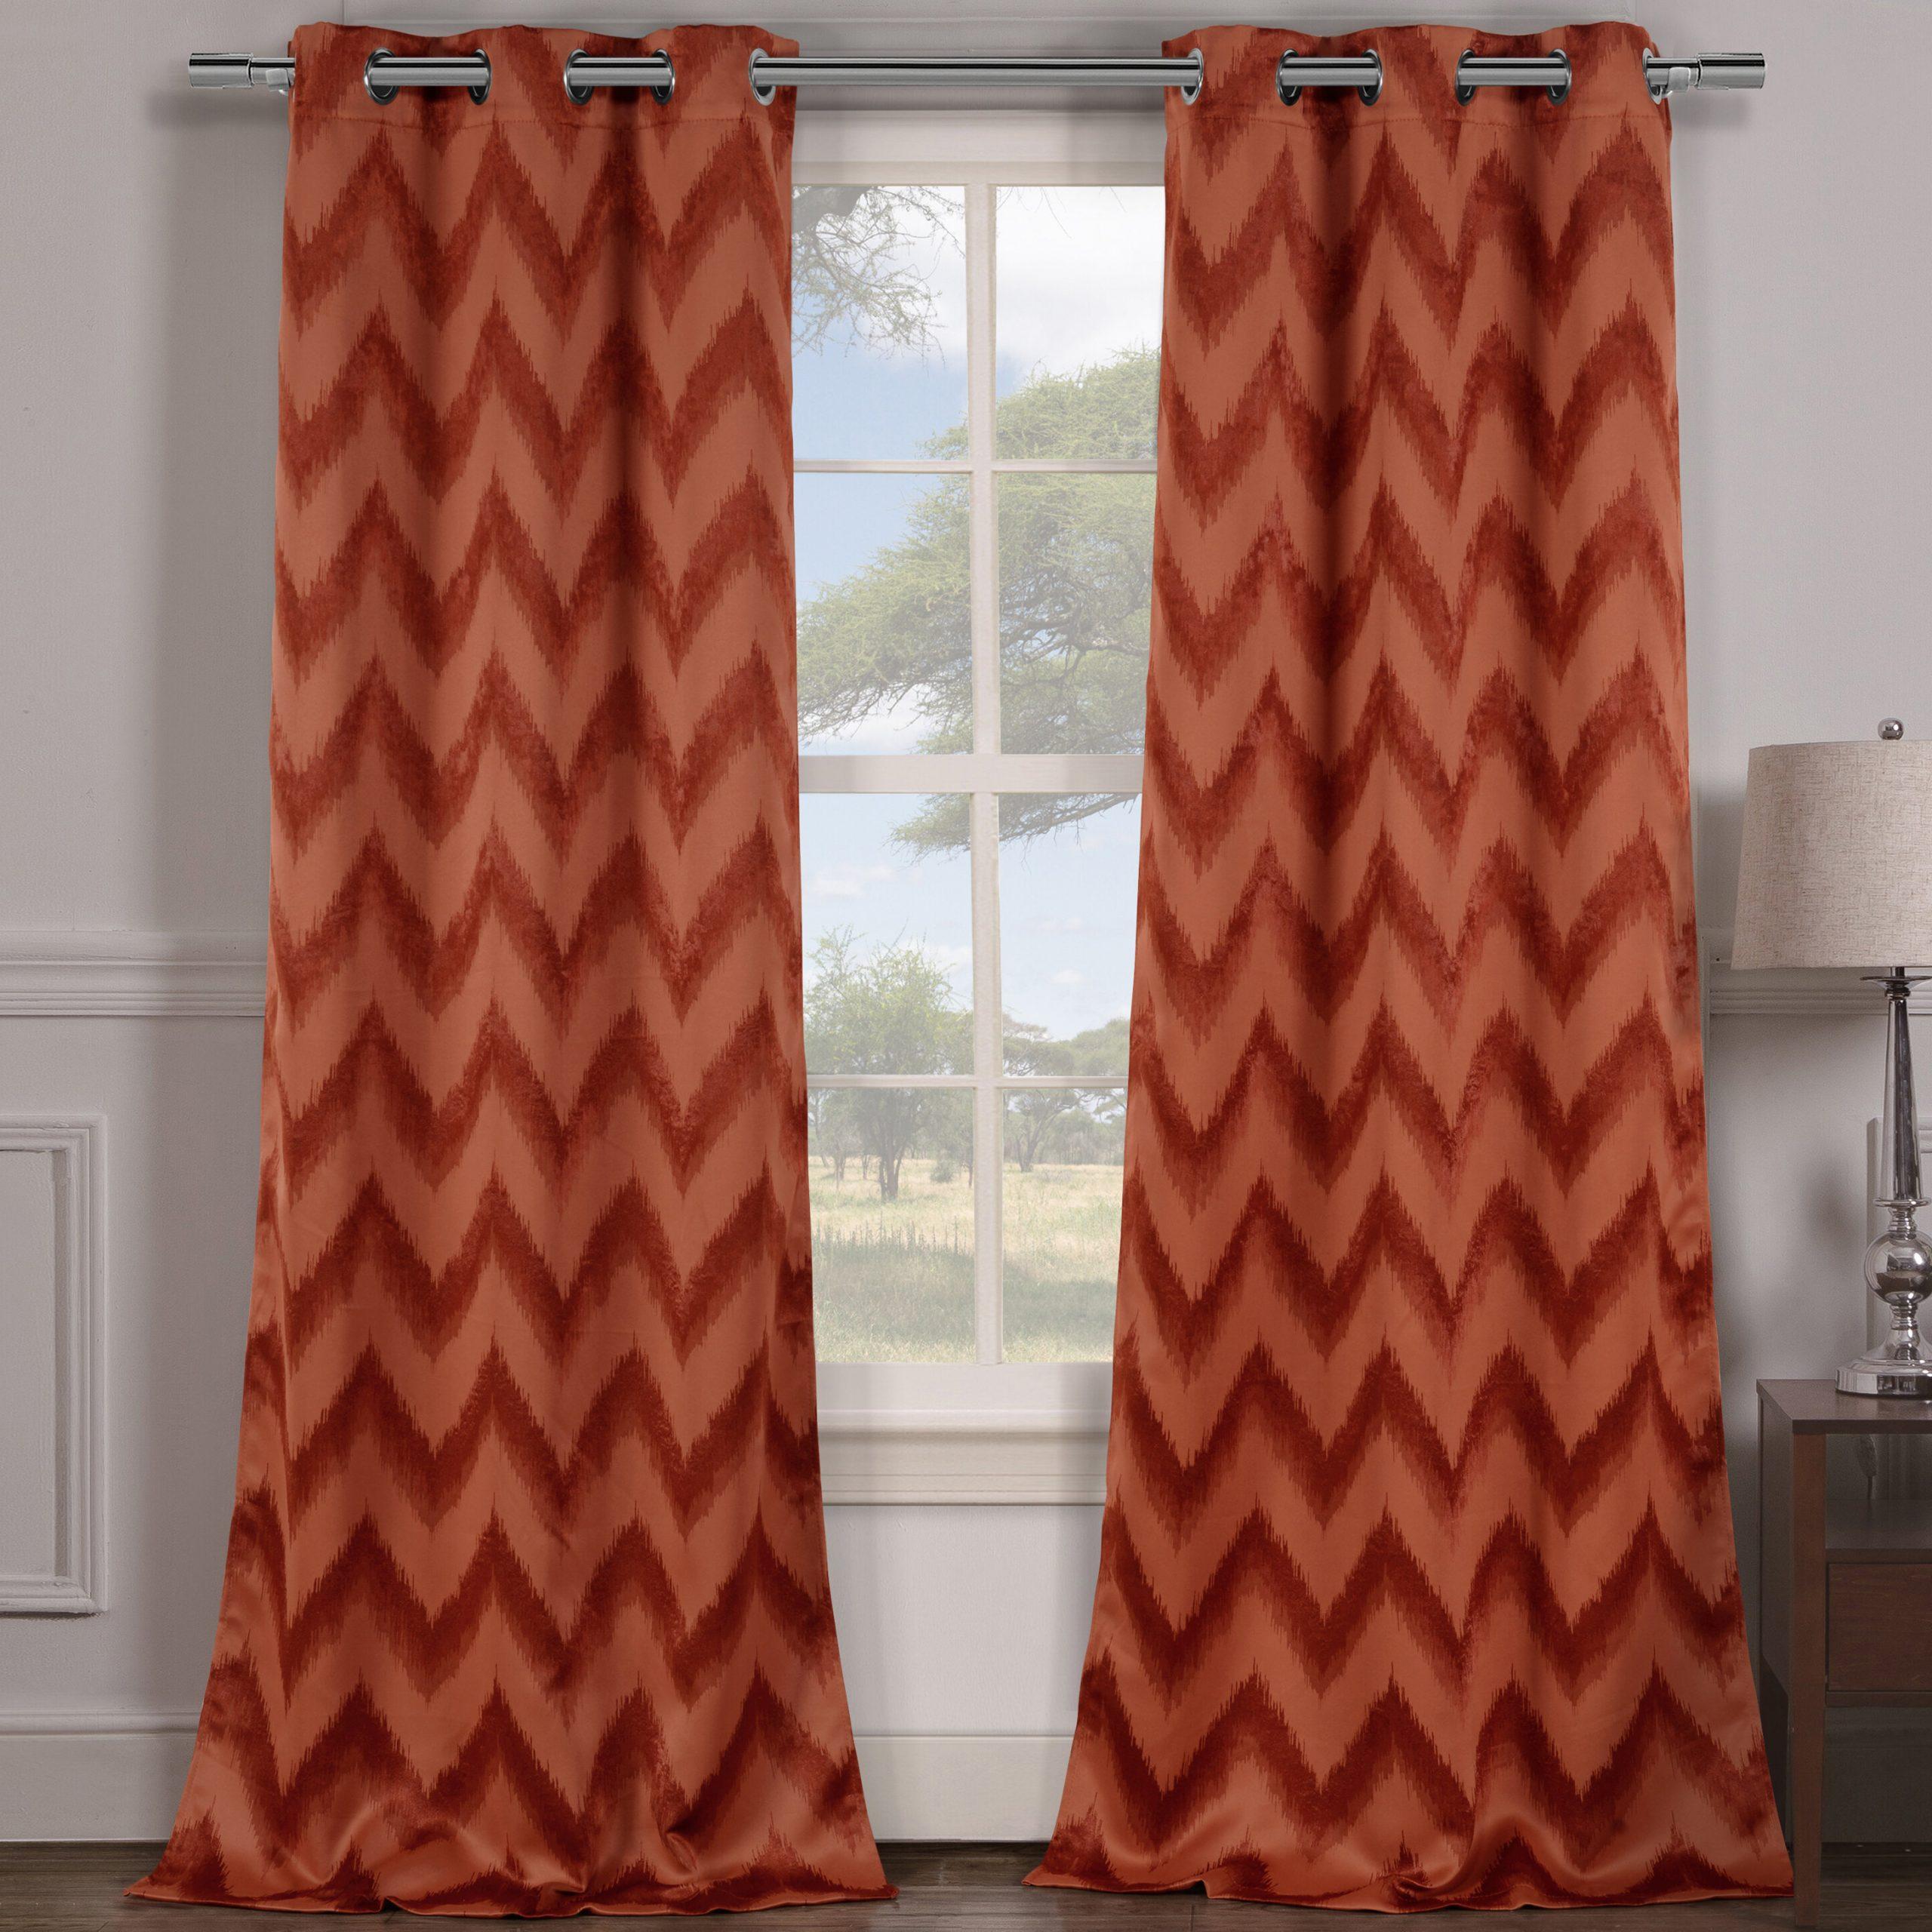 Chevron Blackout Grommet Curtain Panels For Best And Newest Jacksonwald Chevron Blackout Grommet Curtain Panels (View 4 of 20)